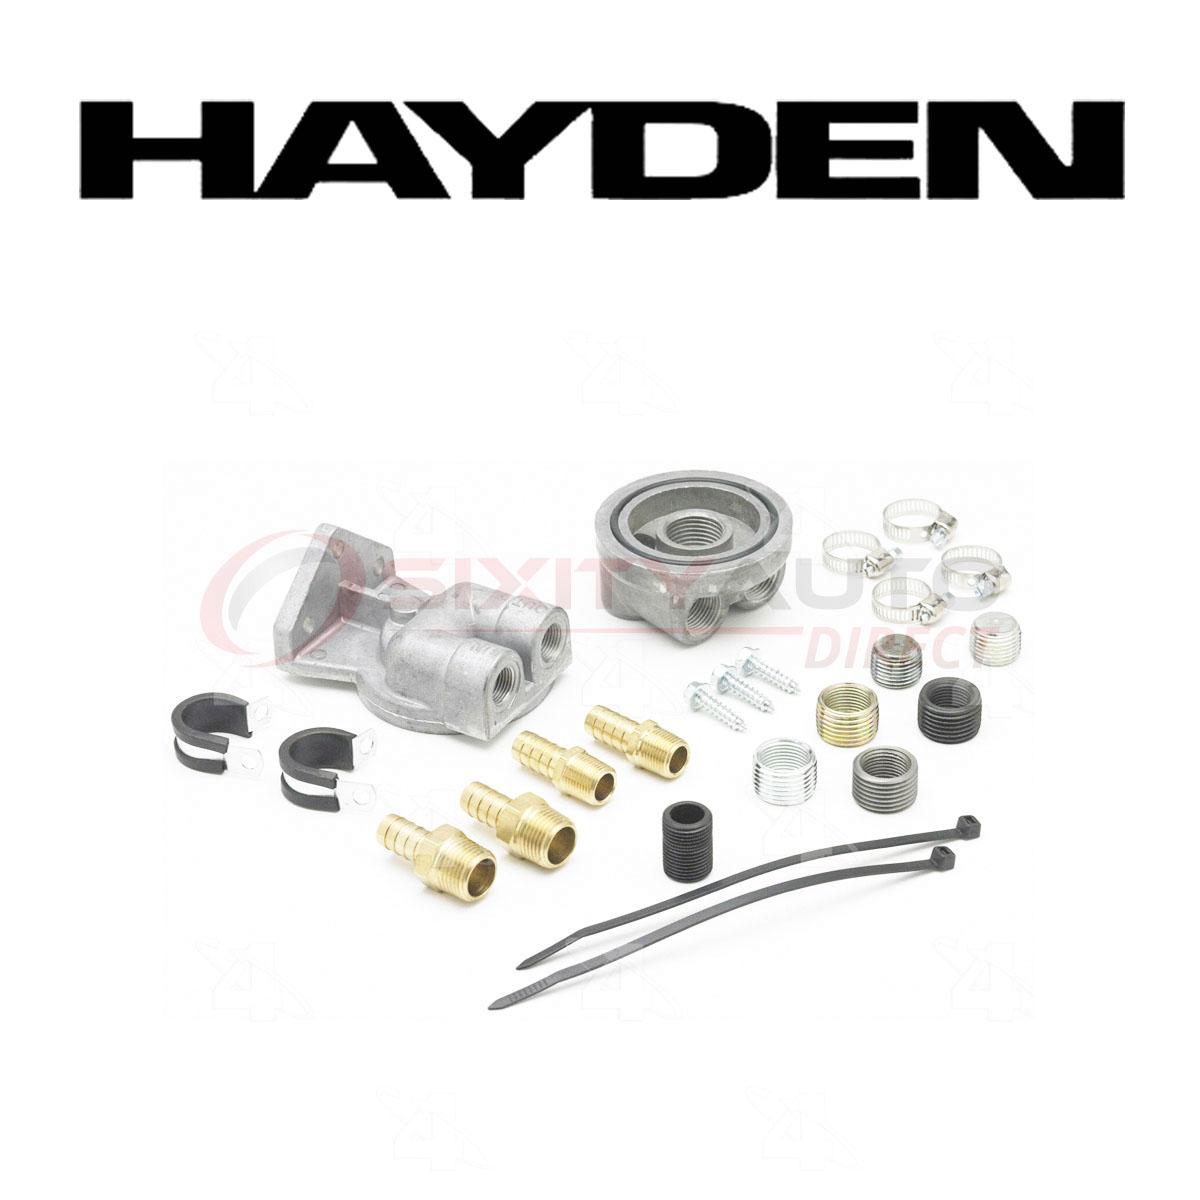 Hayden Oil Filter Remote Mounting Kit for 2000-2002 Mazda